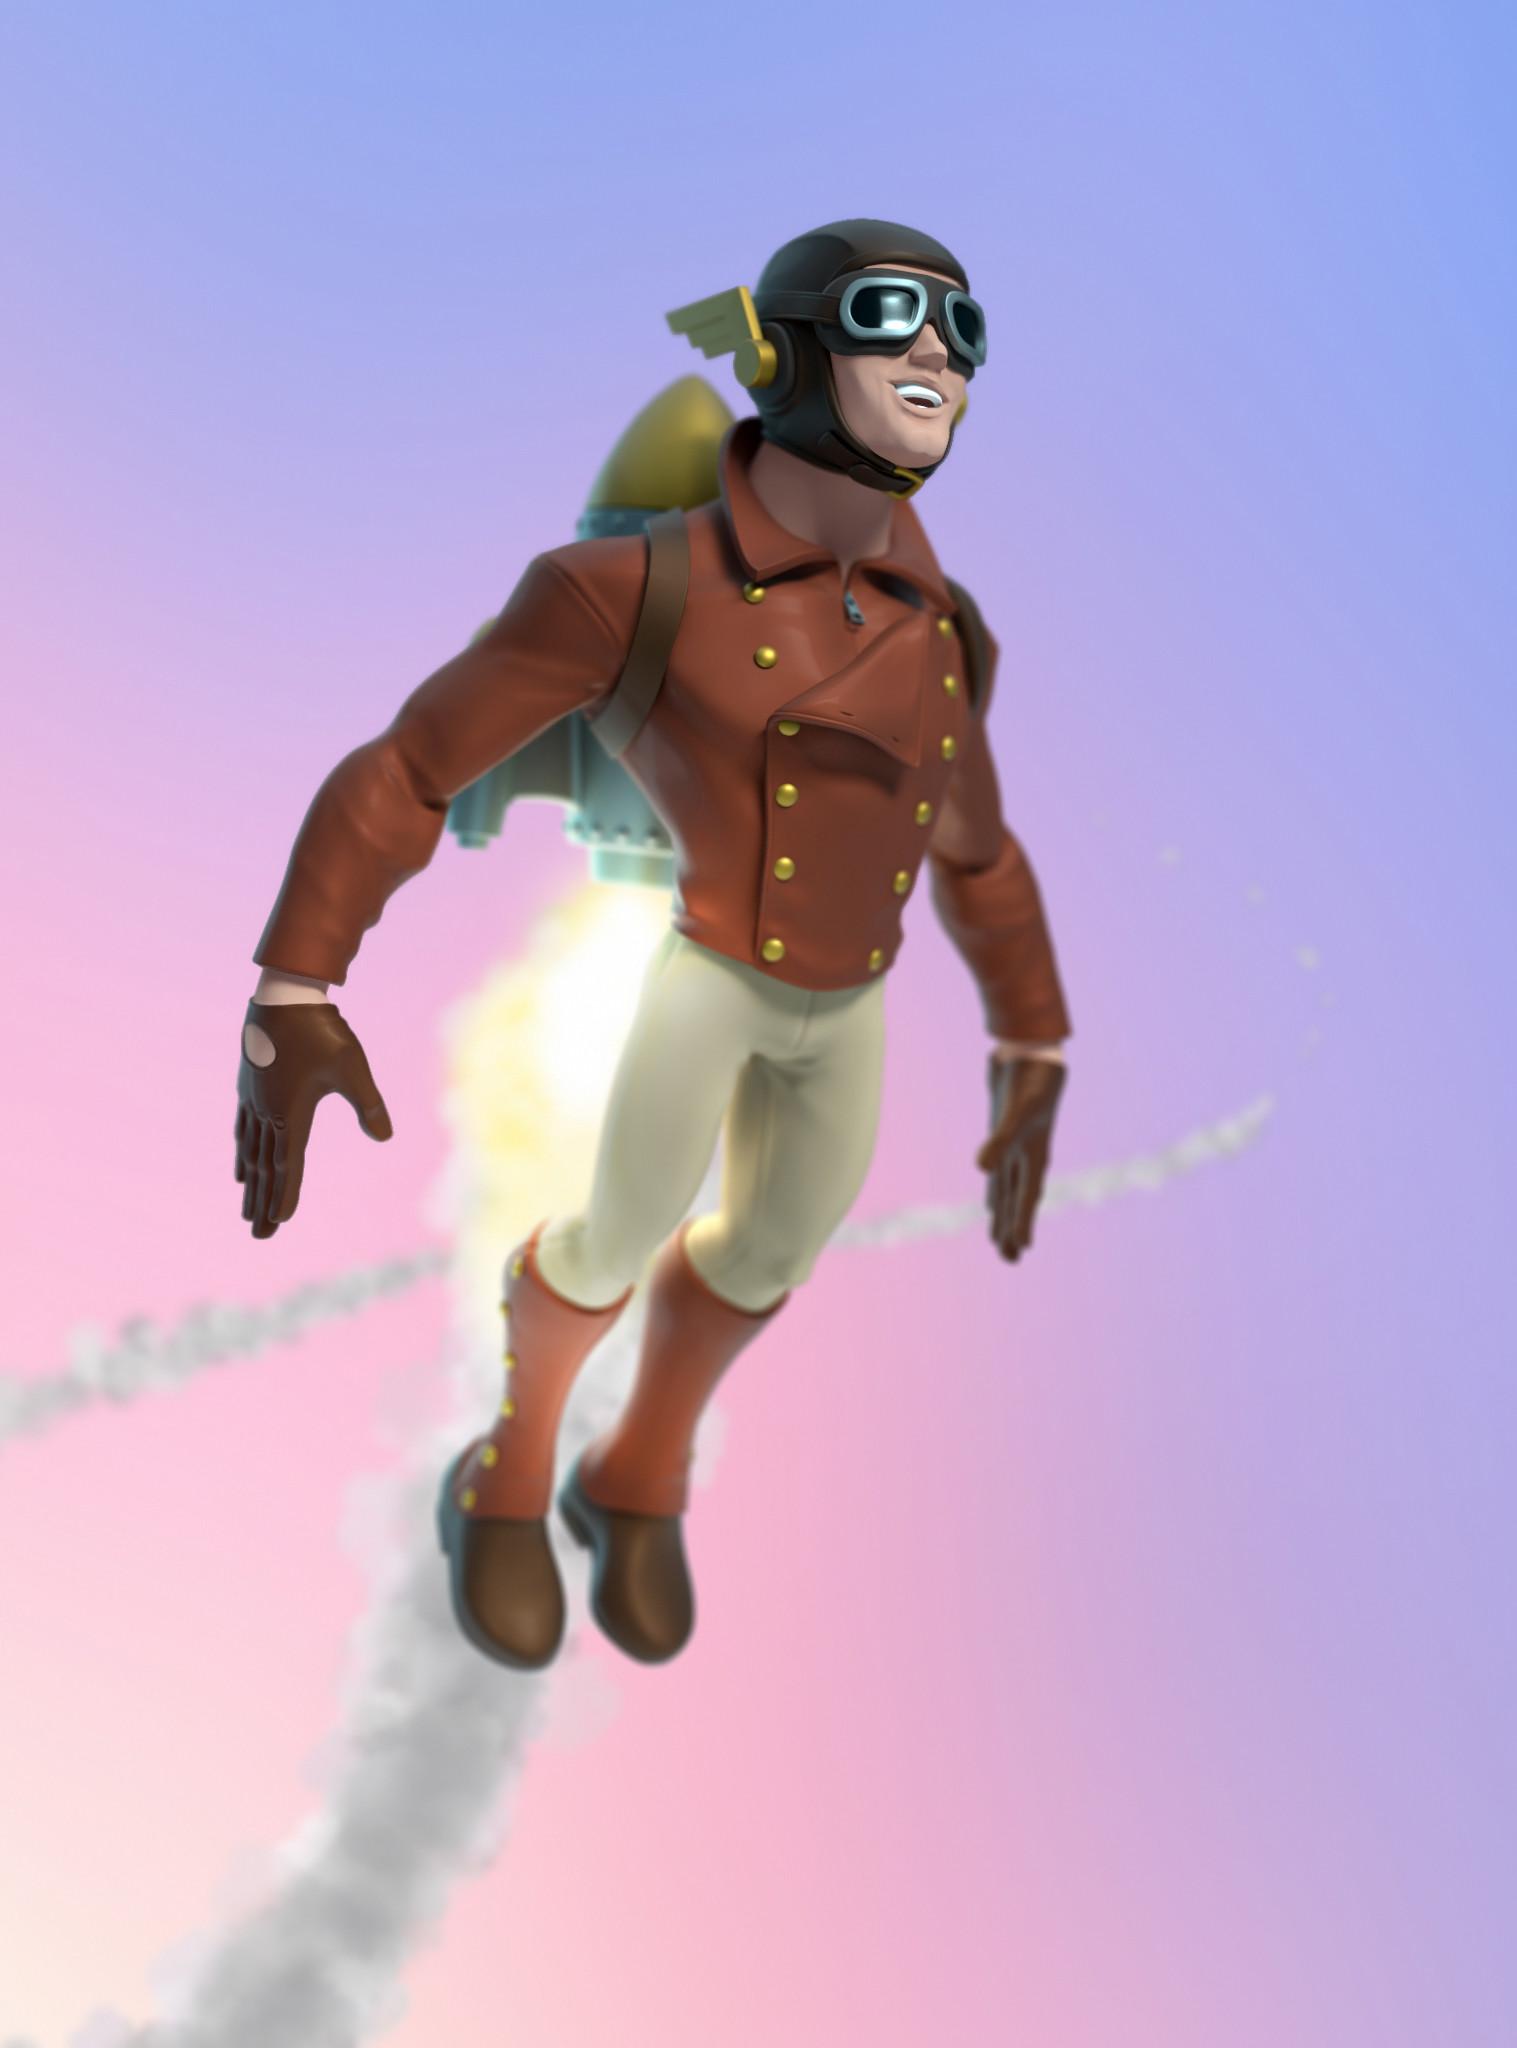 Dave viola rocket